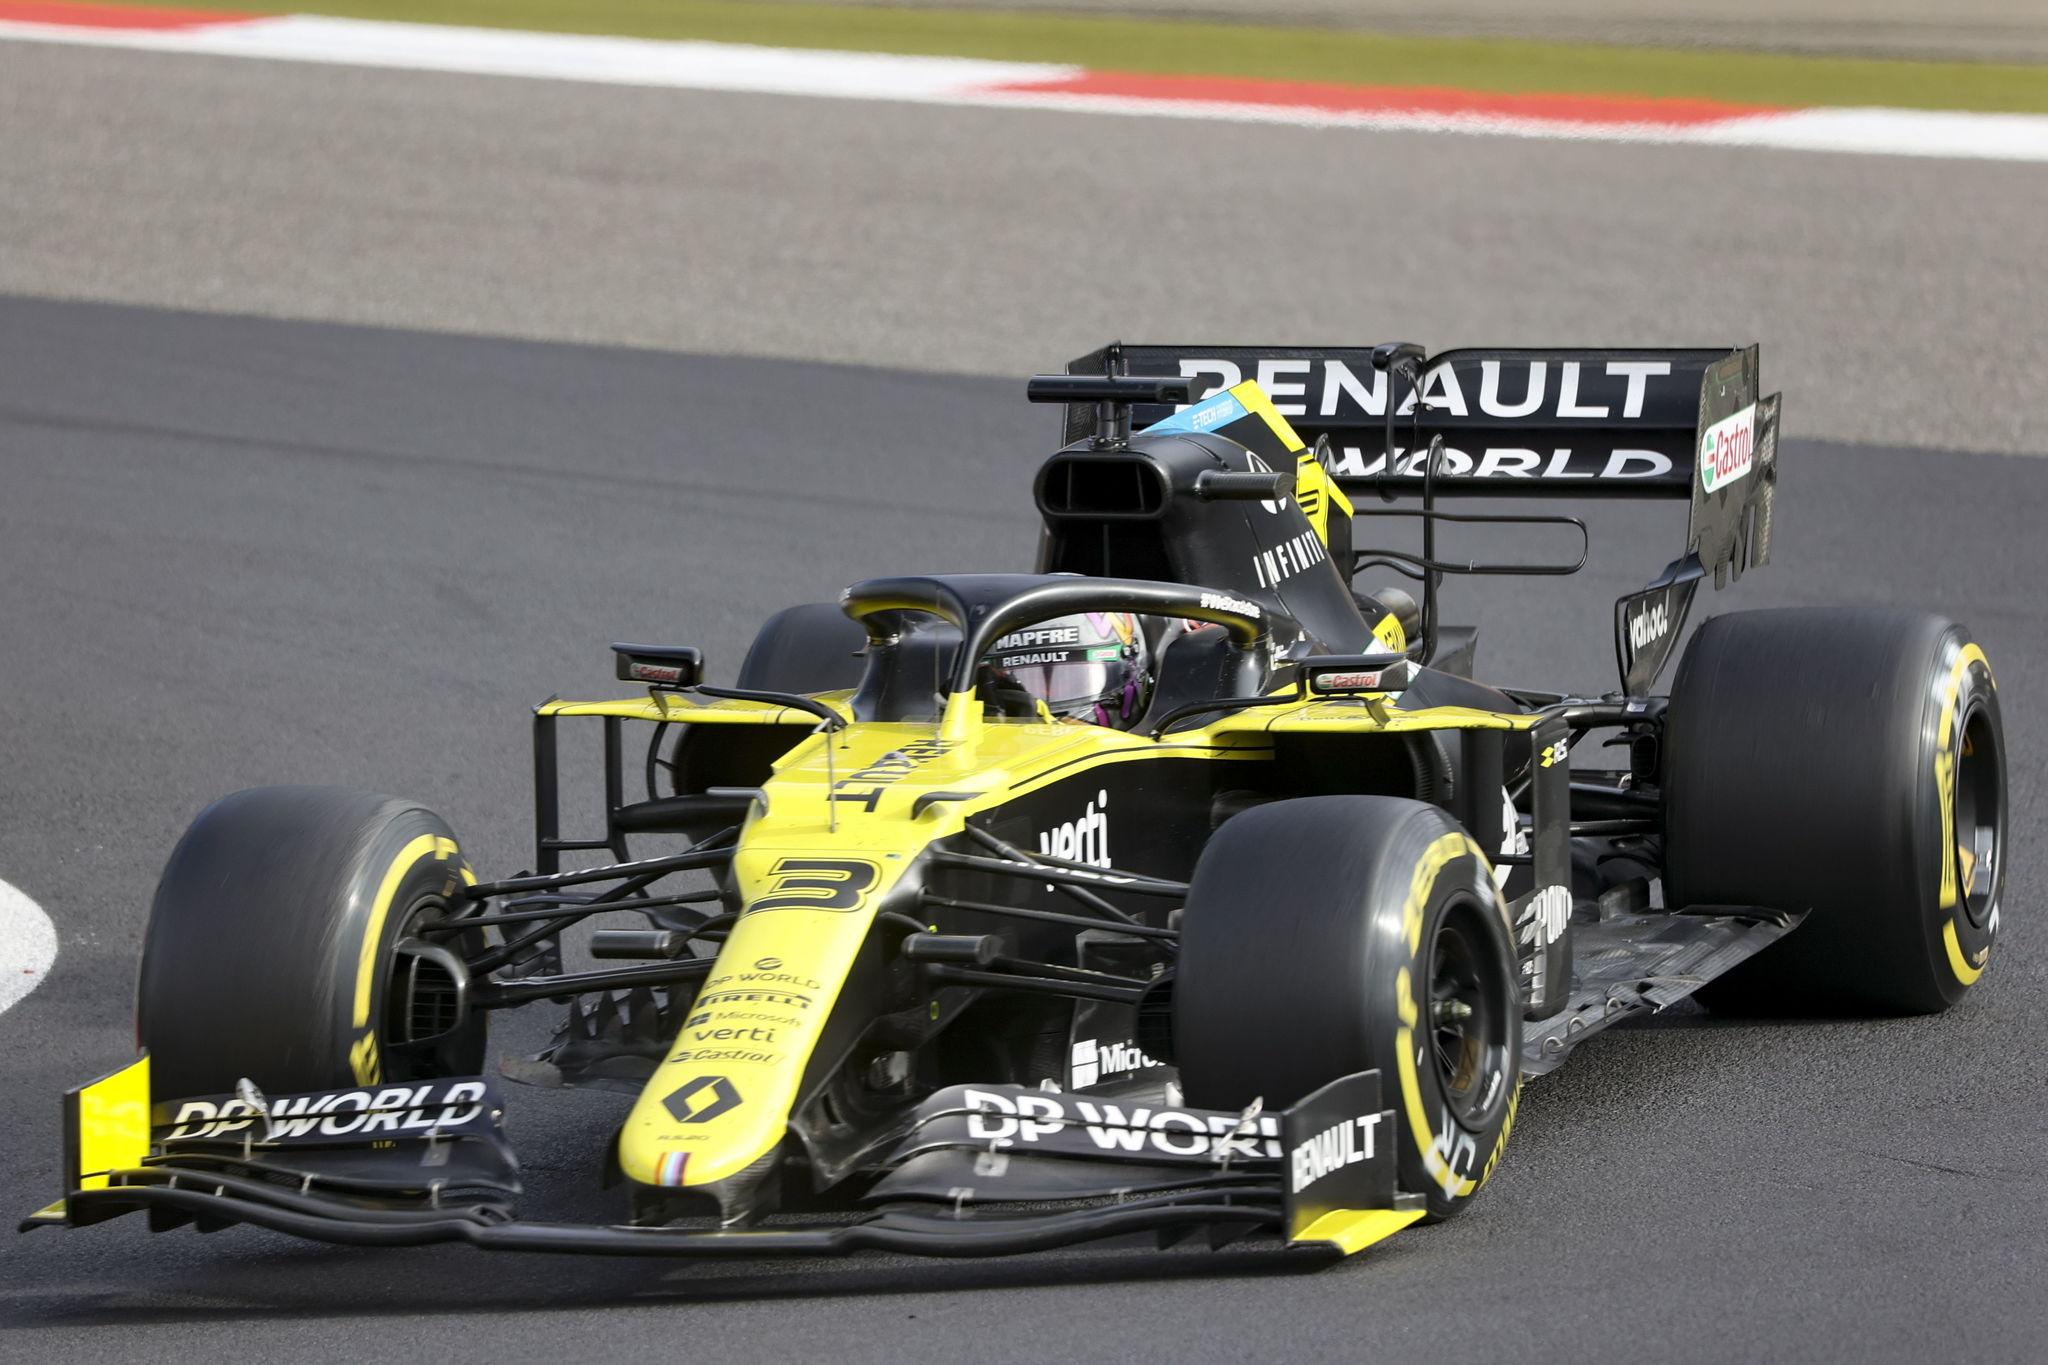 Nuerburg (Germany), 11/10/2020.- Australian Formula One driver Daniel lt;HIT gt;Ricciardo lt;/HIT gt; of Renault in action during the 2020 Formula One Eifel Grand Prix at the Nuerburgring race track in Nuerburg, Germany, 11 October 2020. (Fórmula Uno, Alemania) EFE/EPA/Wolfgang Rattay / Pool